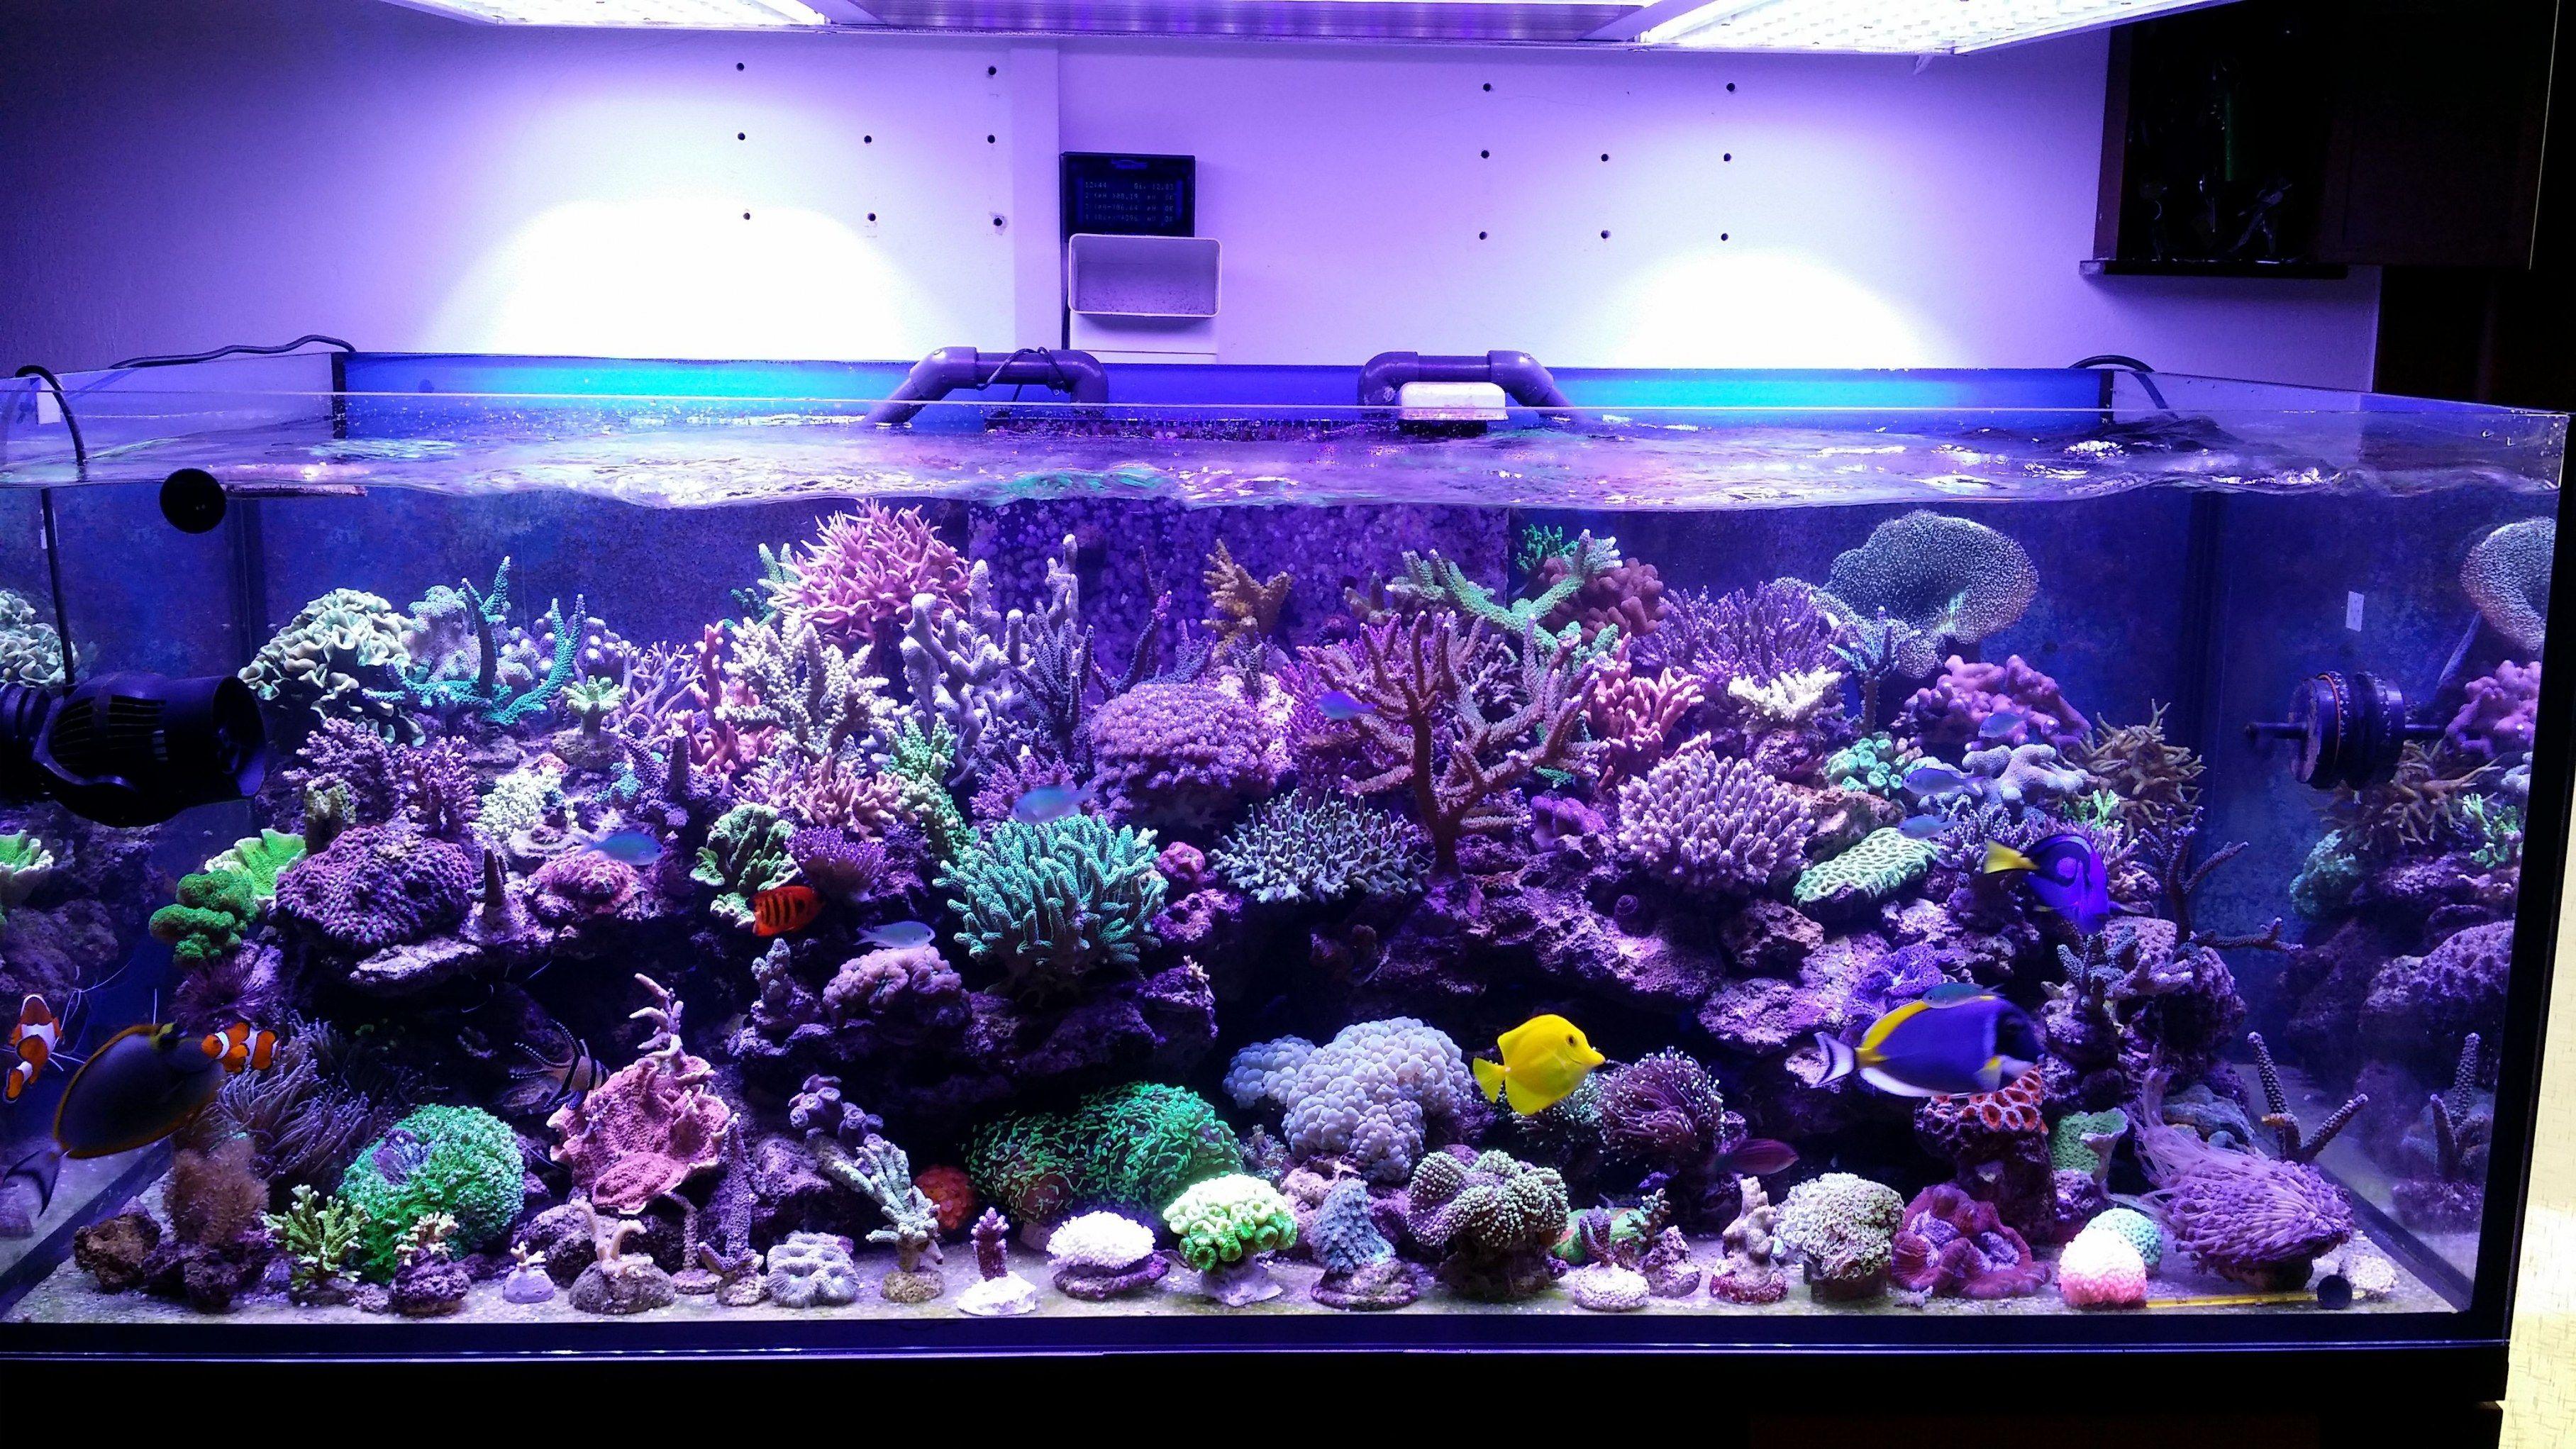 This Custom Led Has The Spectrum To Grow Massive Corals Read More About This Modification Marine Led Lights Led Aquarium Lighting Aquarium Lighting